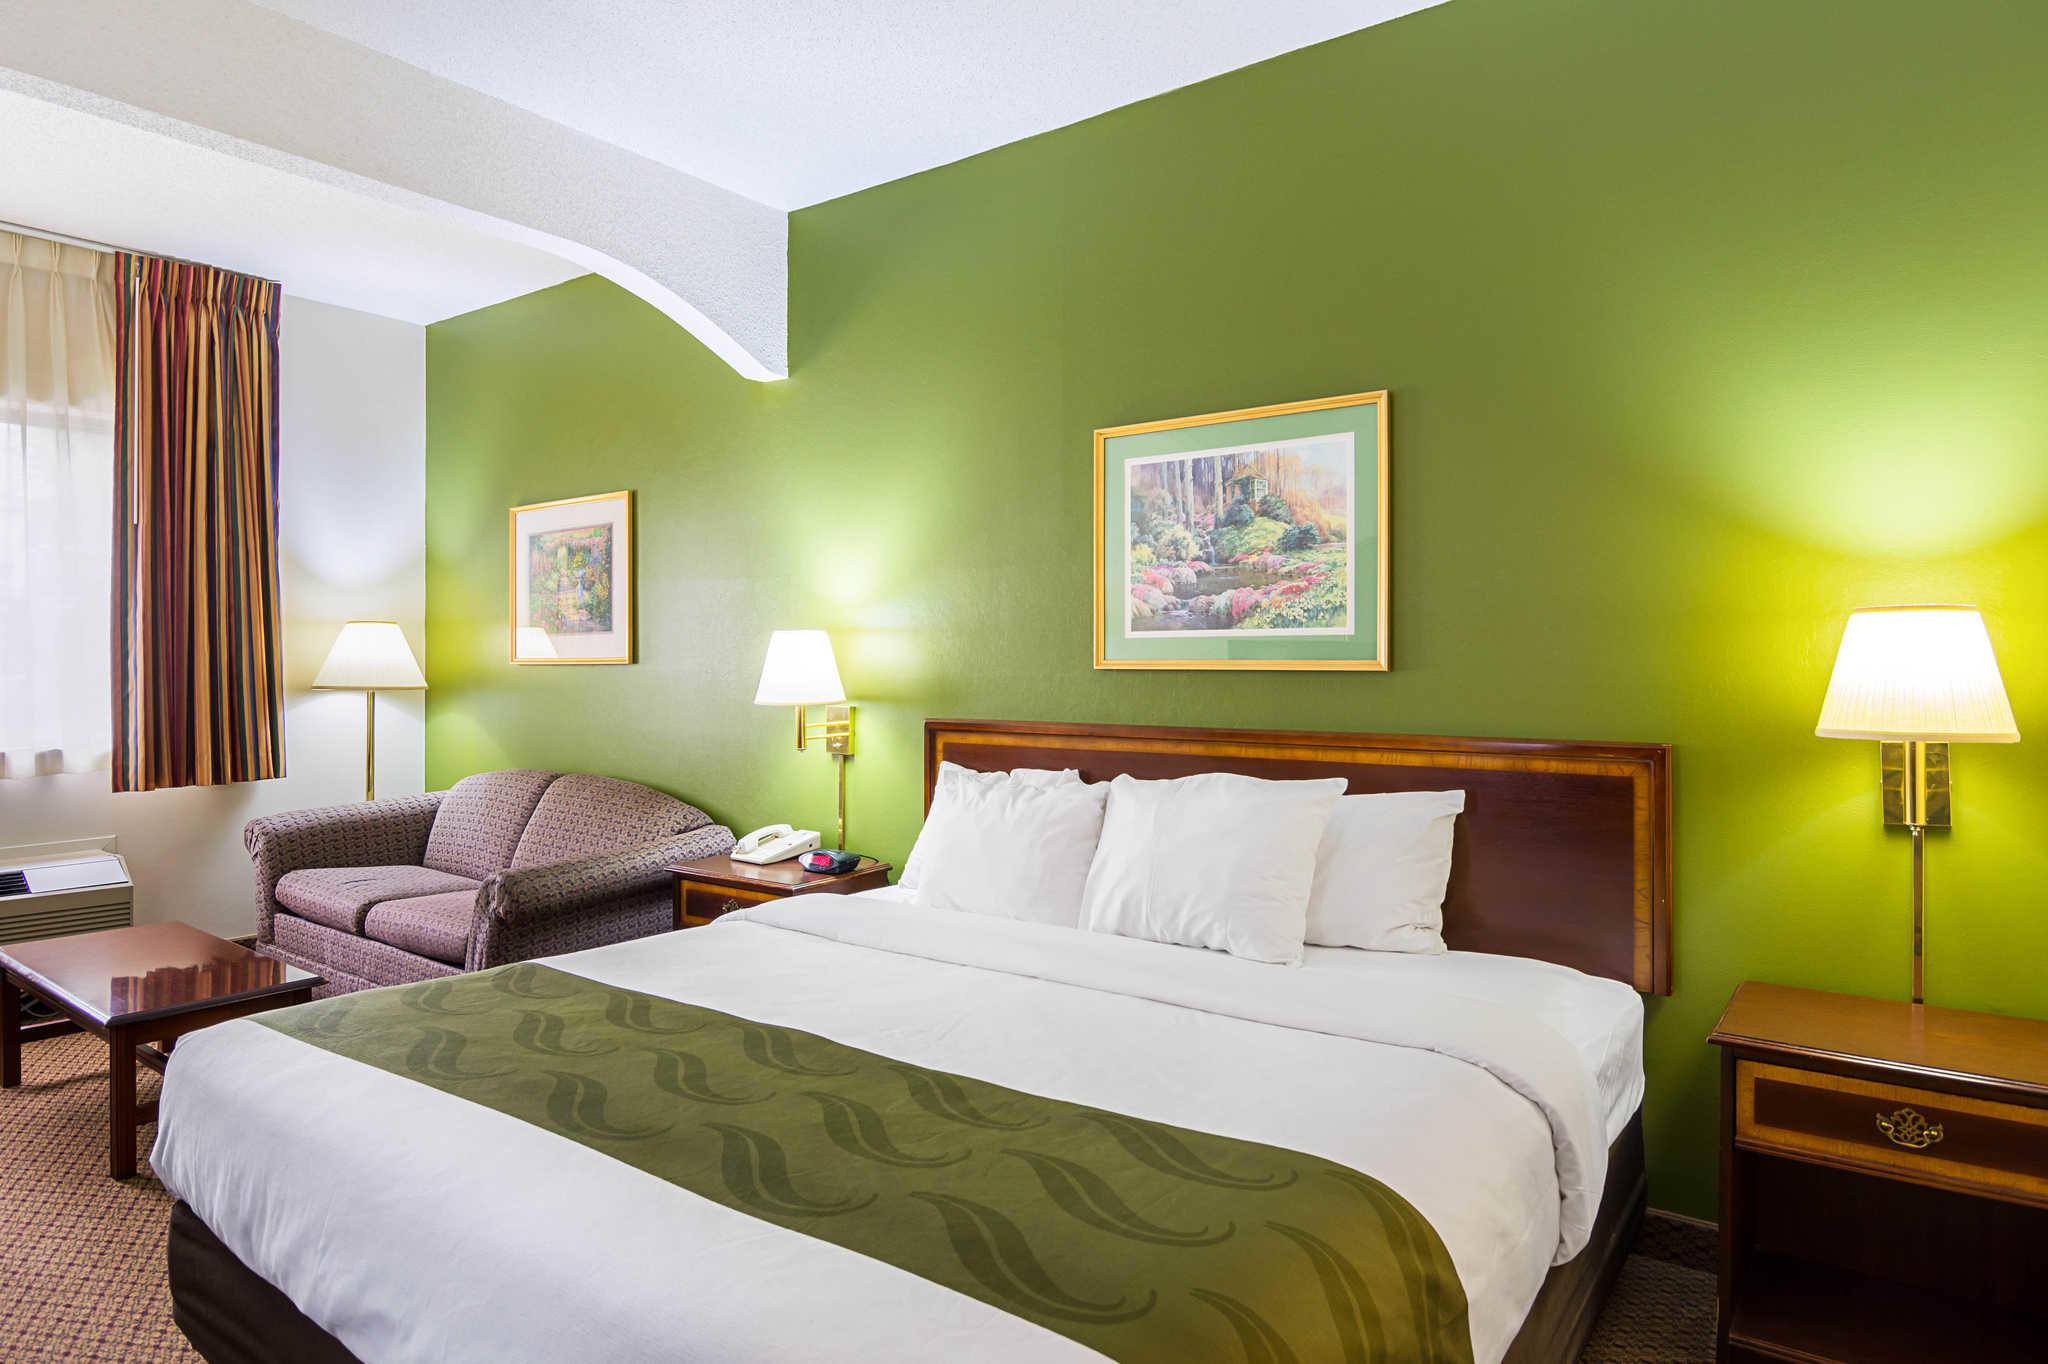 Quality Inn & Suites Kearneysville - Martinsburg image 15